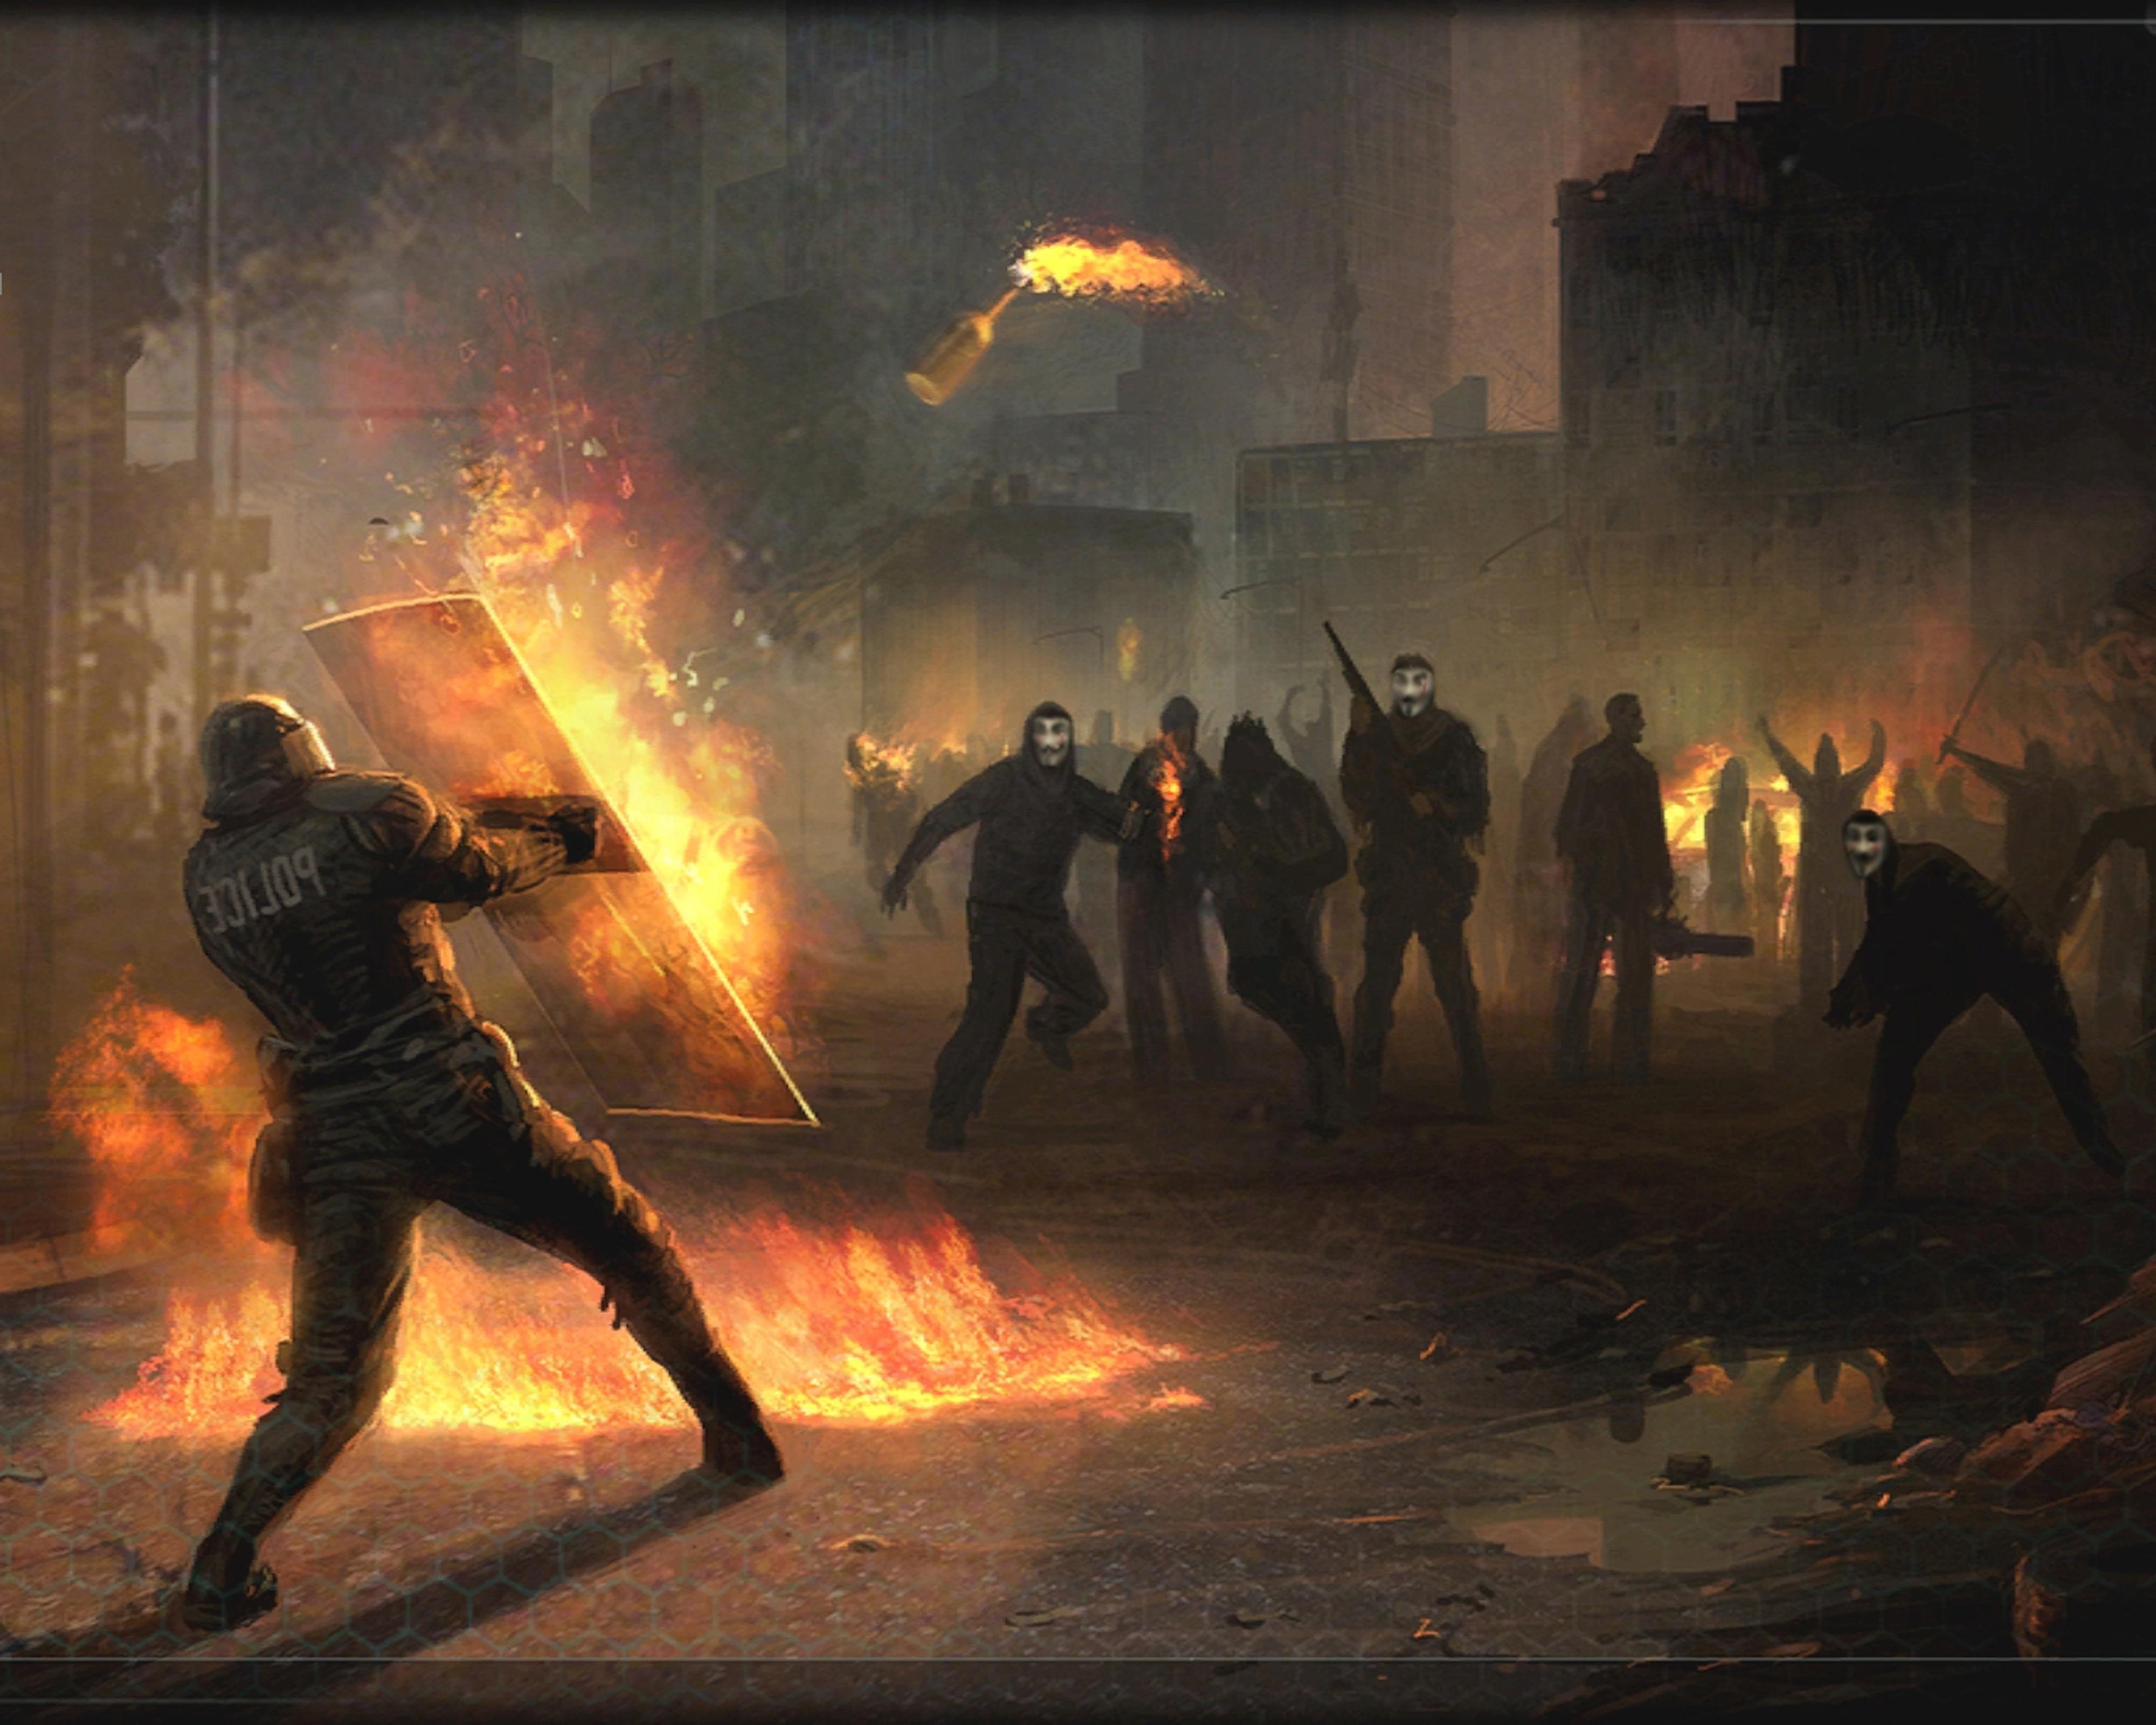 Star Wars Wallpaper Pc Hd Insurgency Rebellion Anonymous Molotov Wallpapers Hd